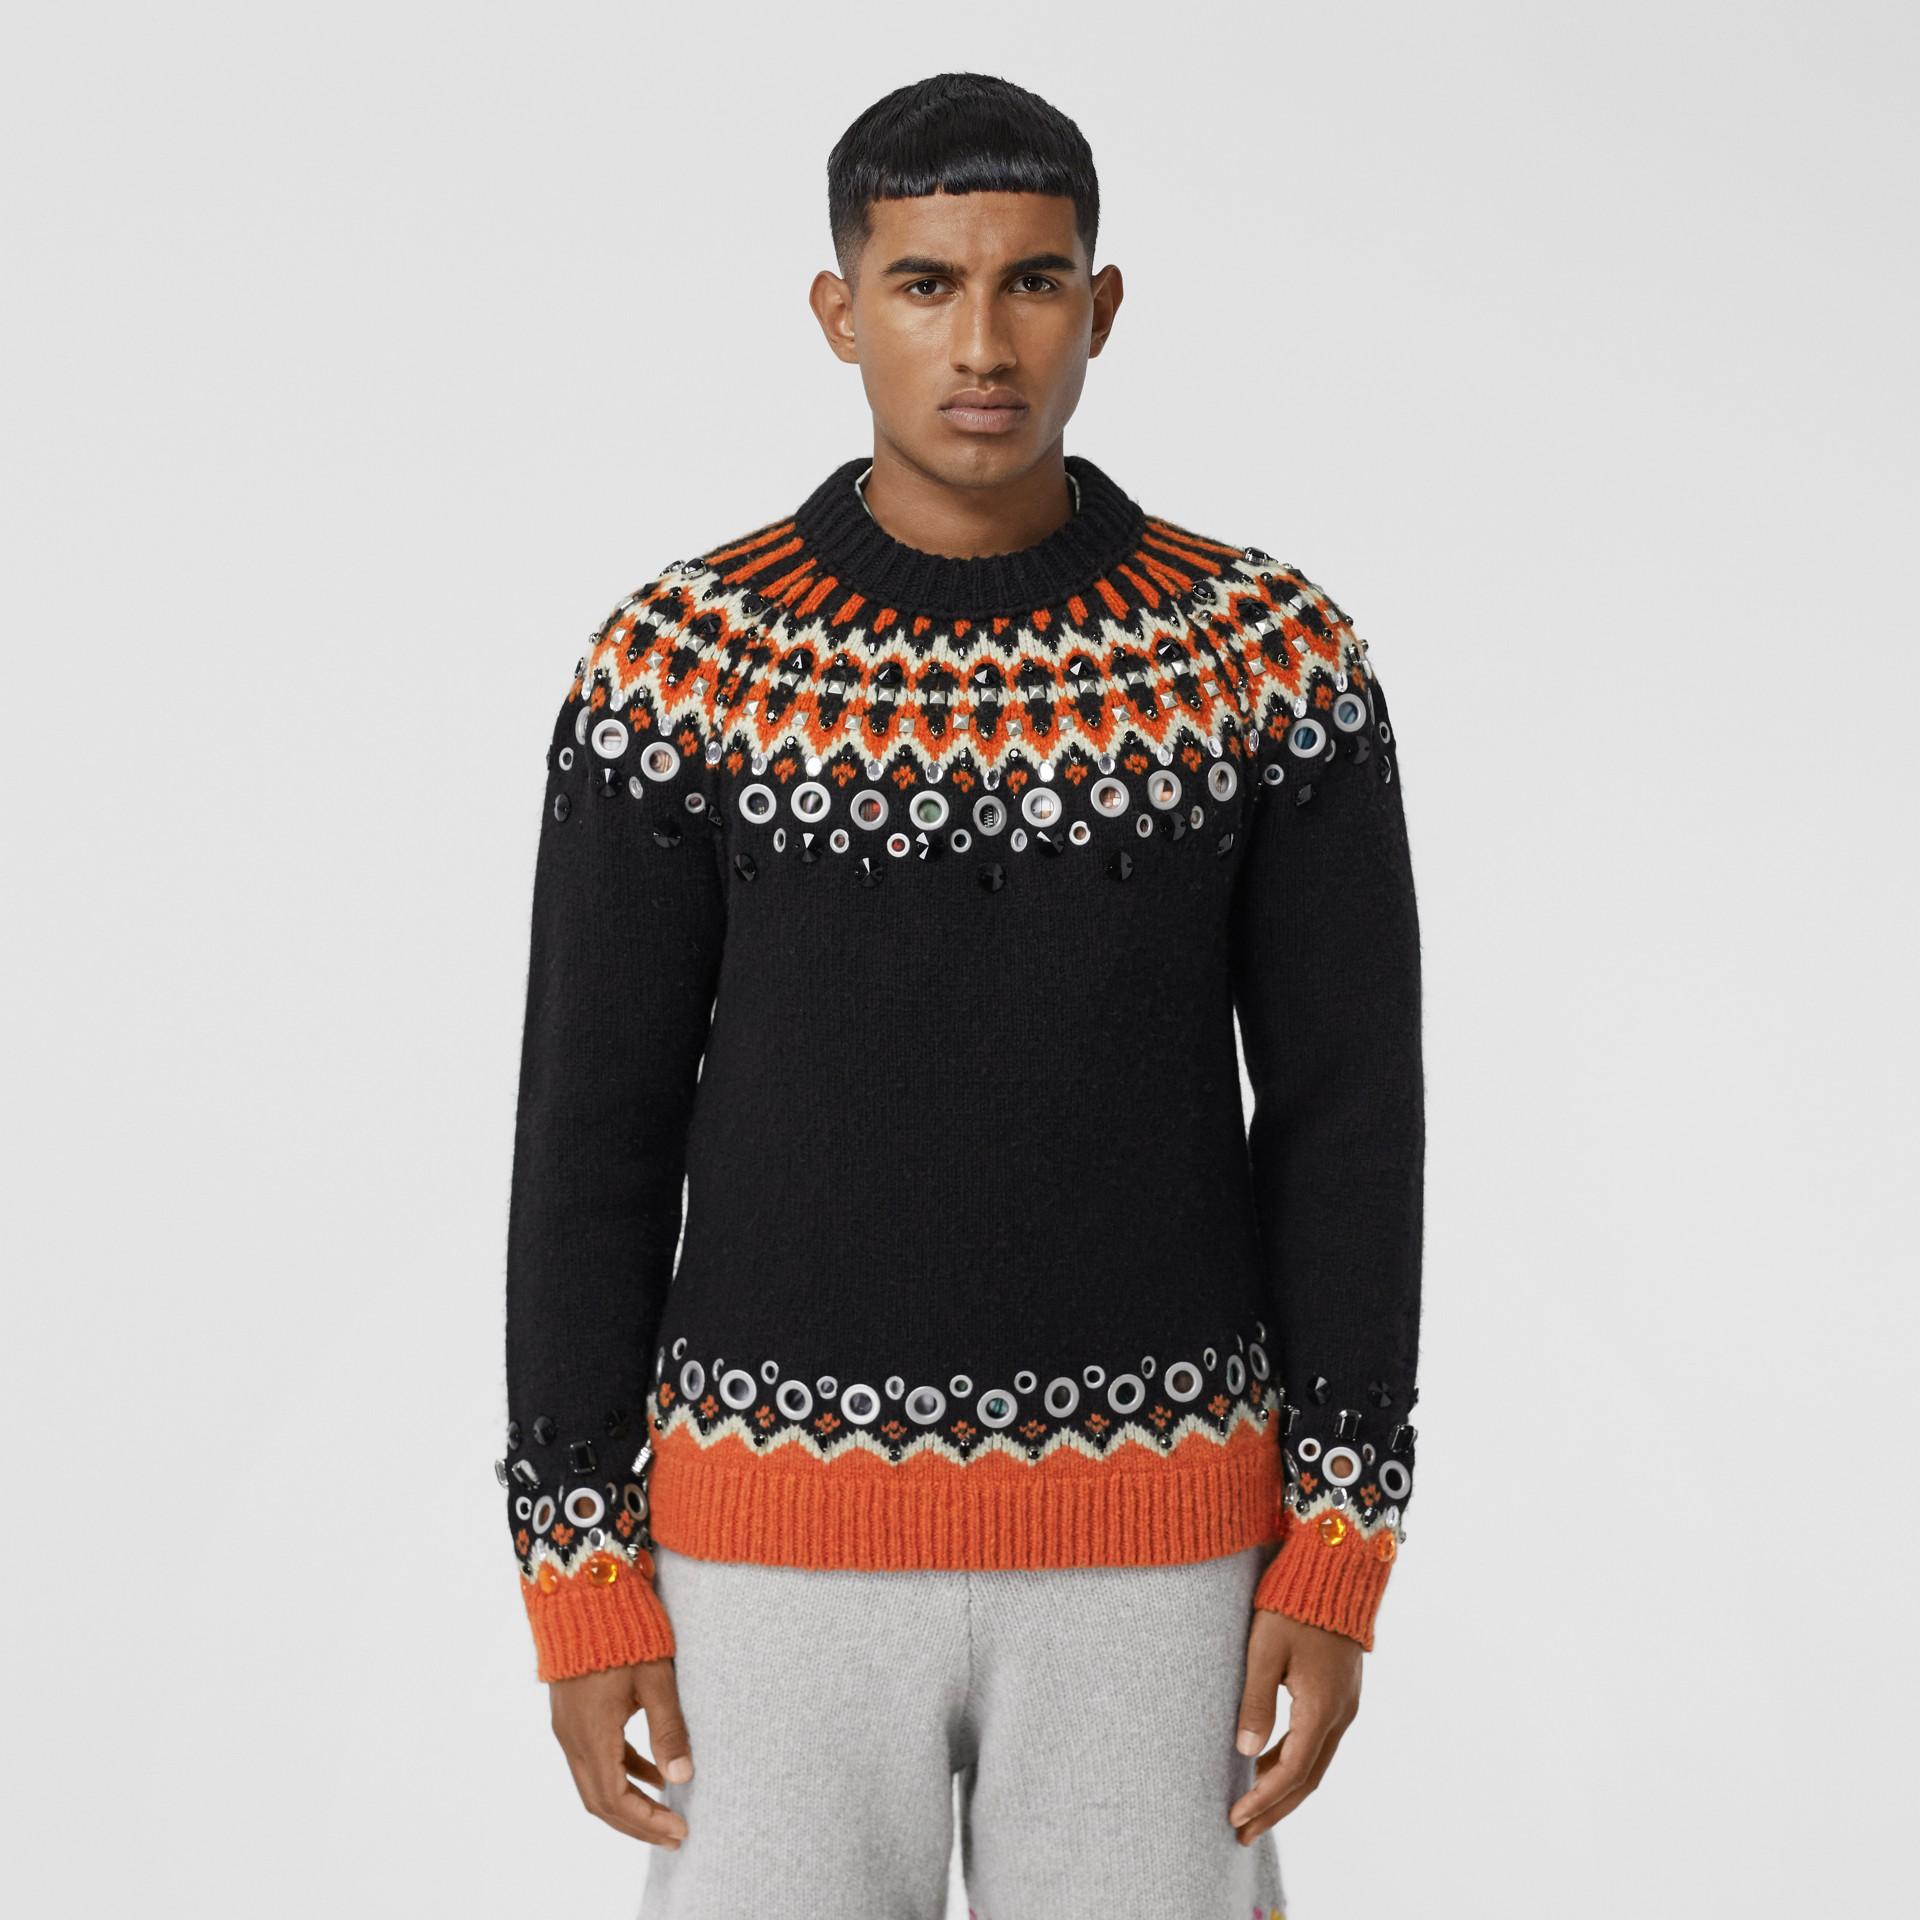 Embellished Fair Isle Wool Sweater in Black - Men | Burberry - gallery image 5